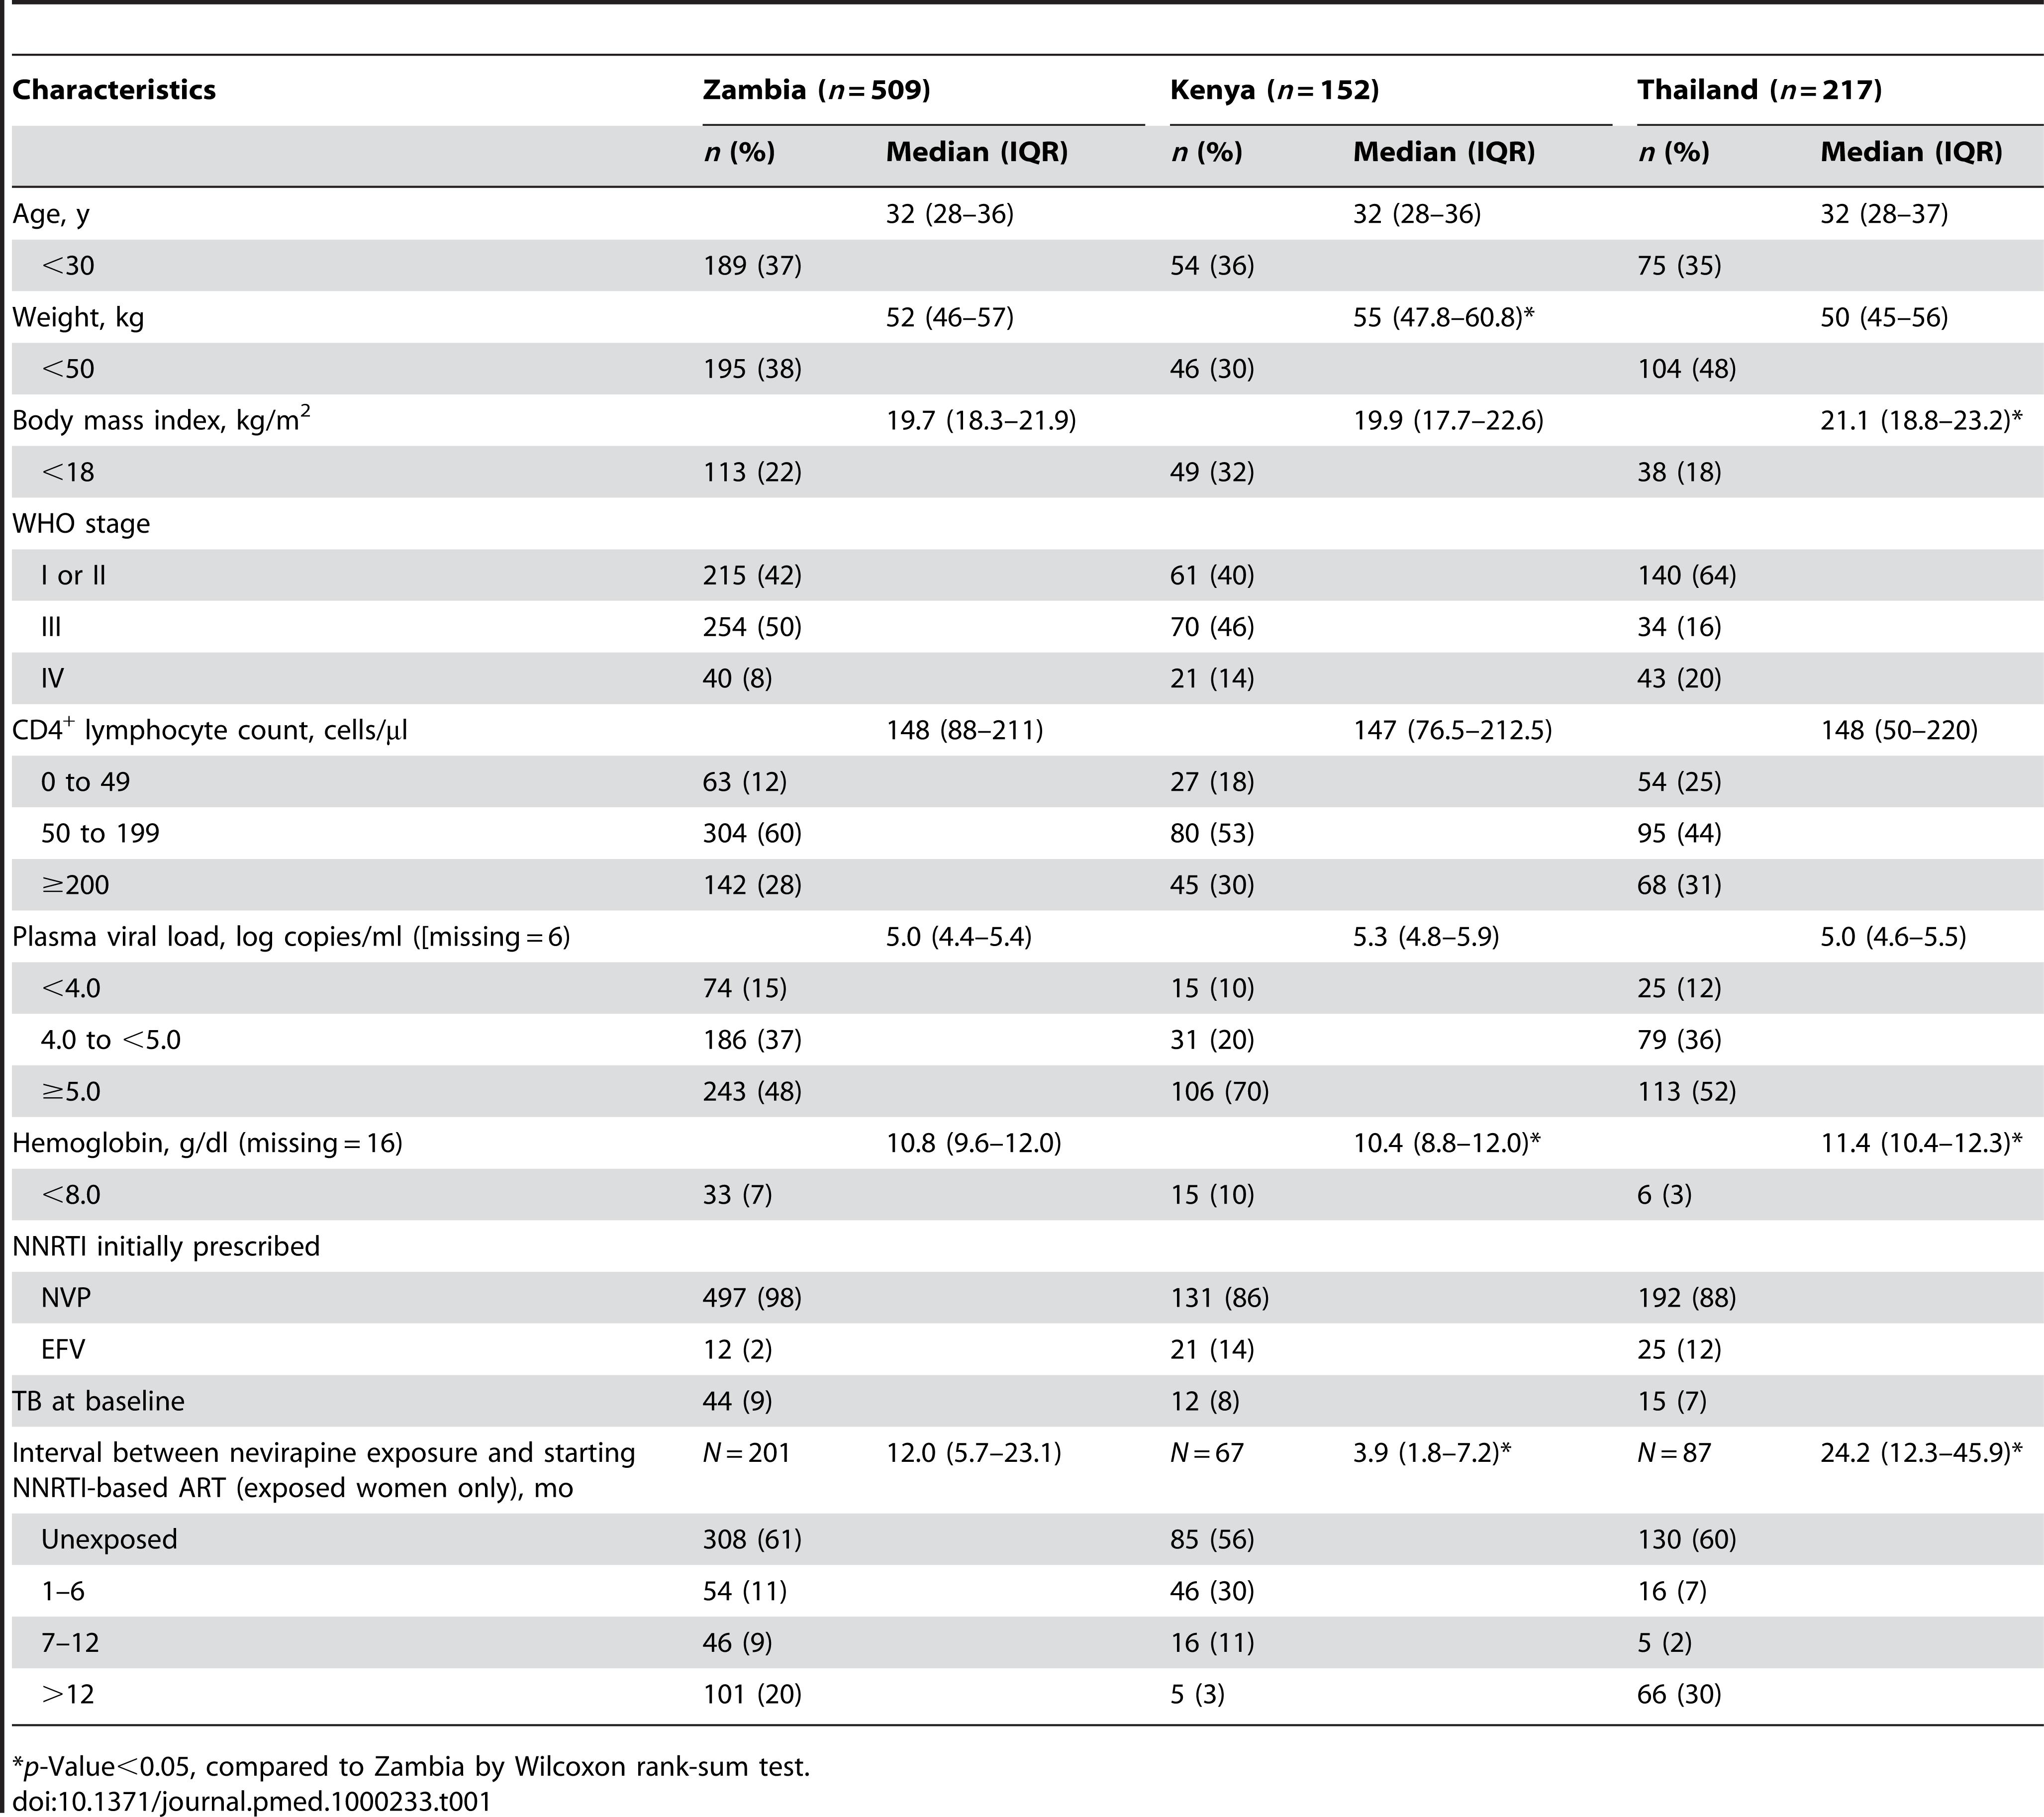 Baseline characteristics of participants enrolled in the NNRTI Response Study—Zambia, Kenya, Thailand (2005–2008).